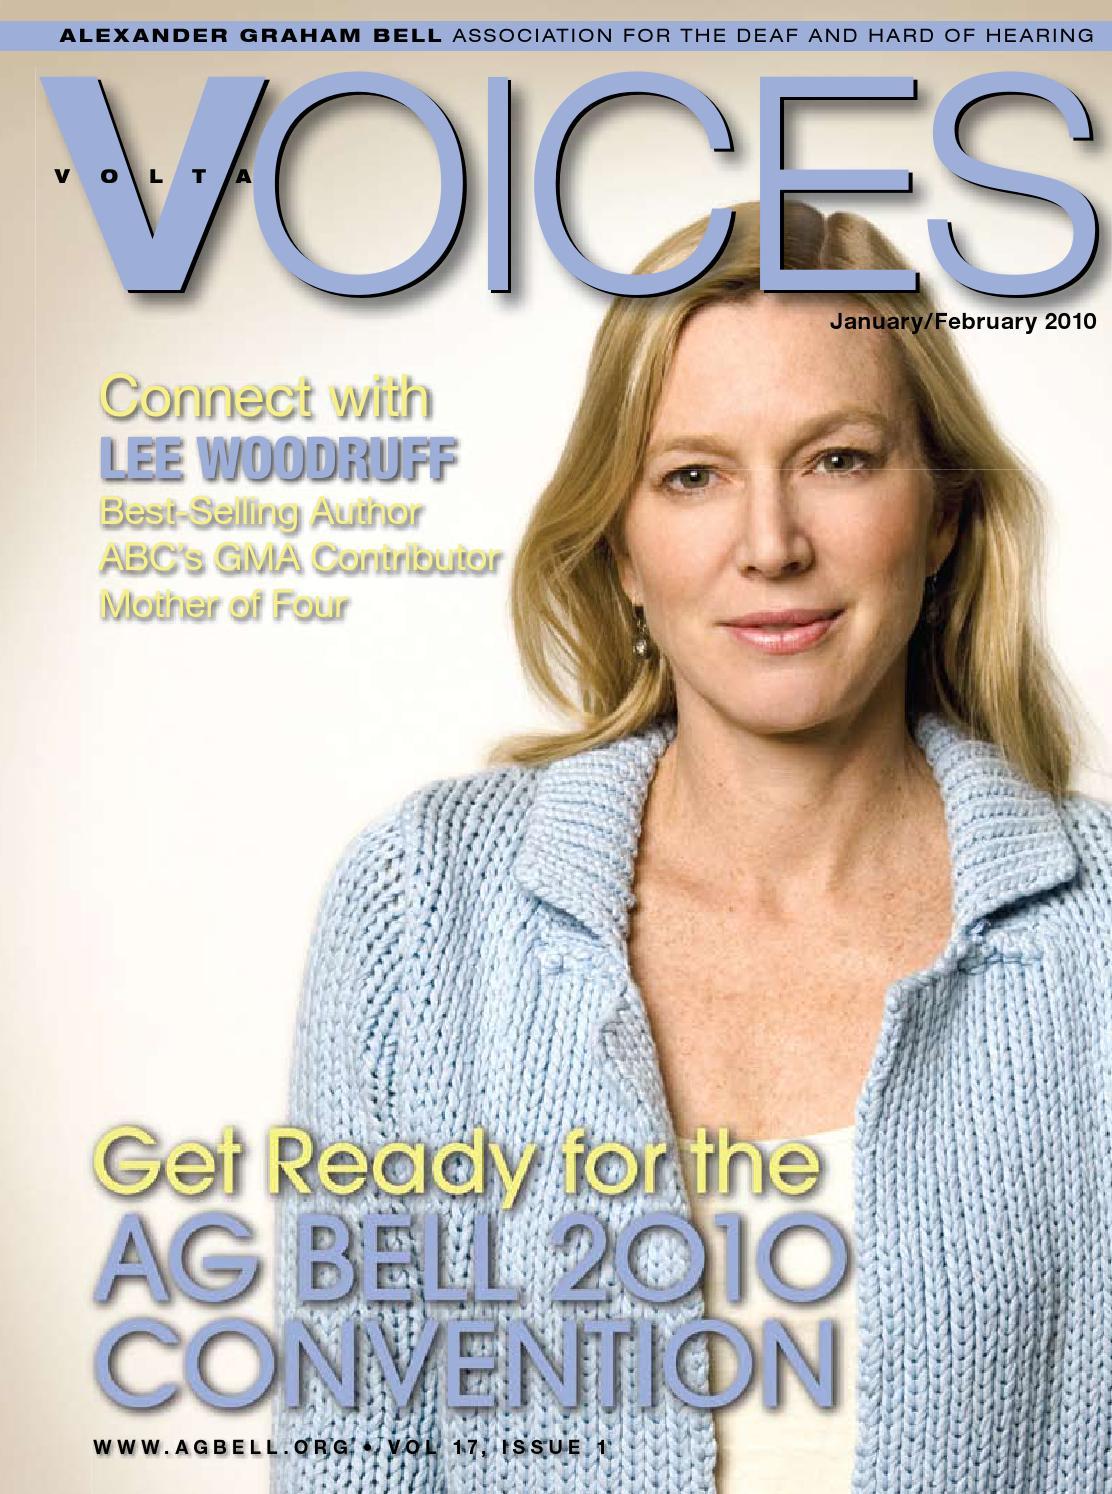 volta voices january february 2010 magazine by alexander graham